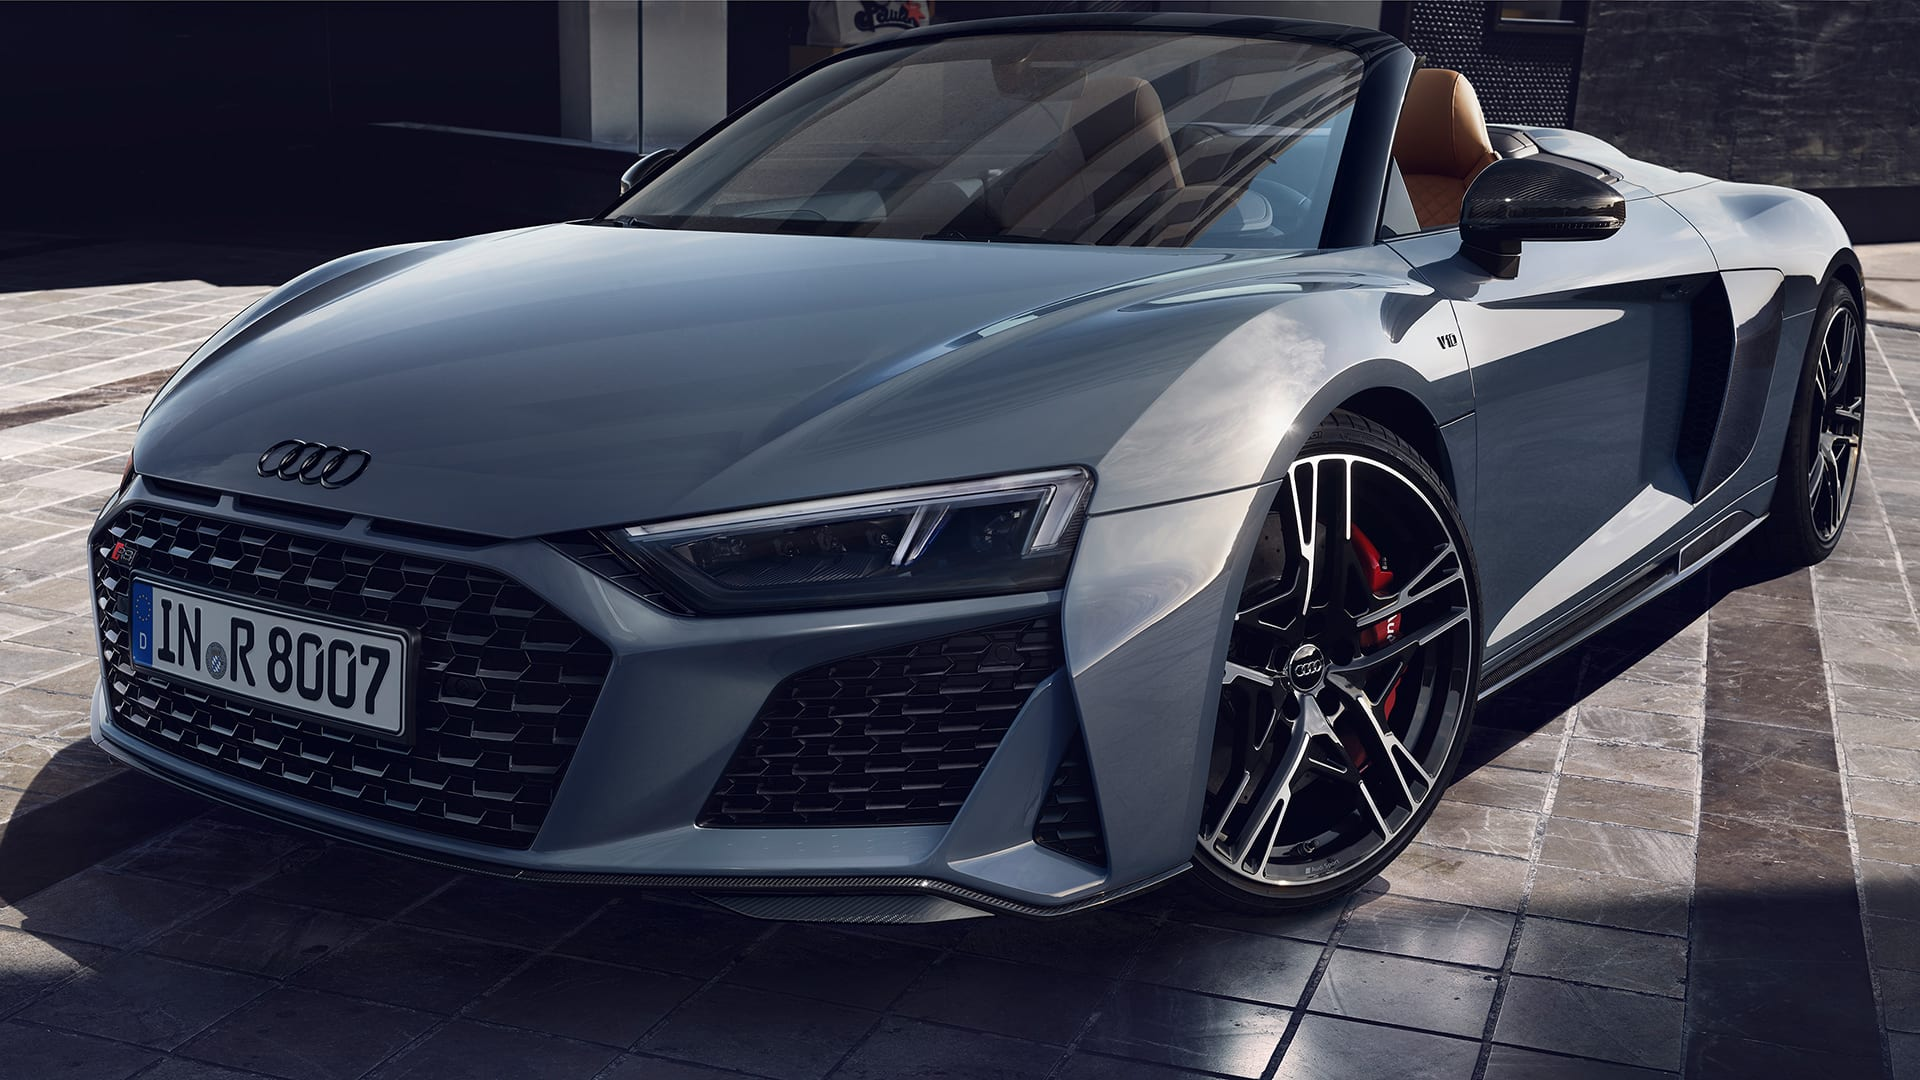 2020 Audi R8 V10 Spyder History